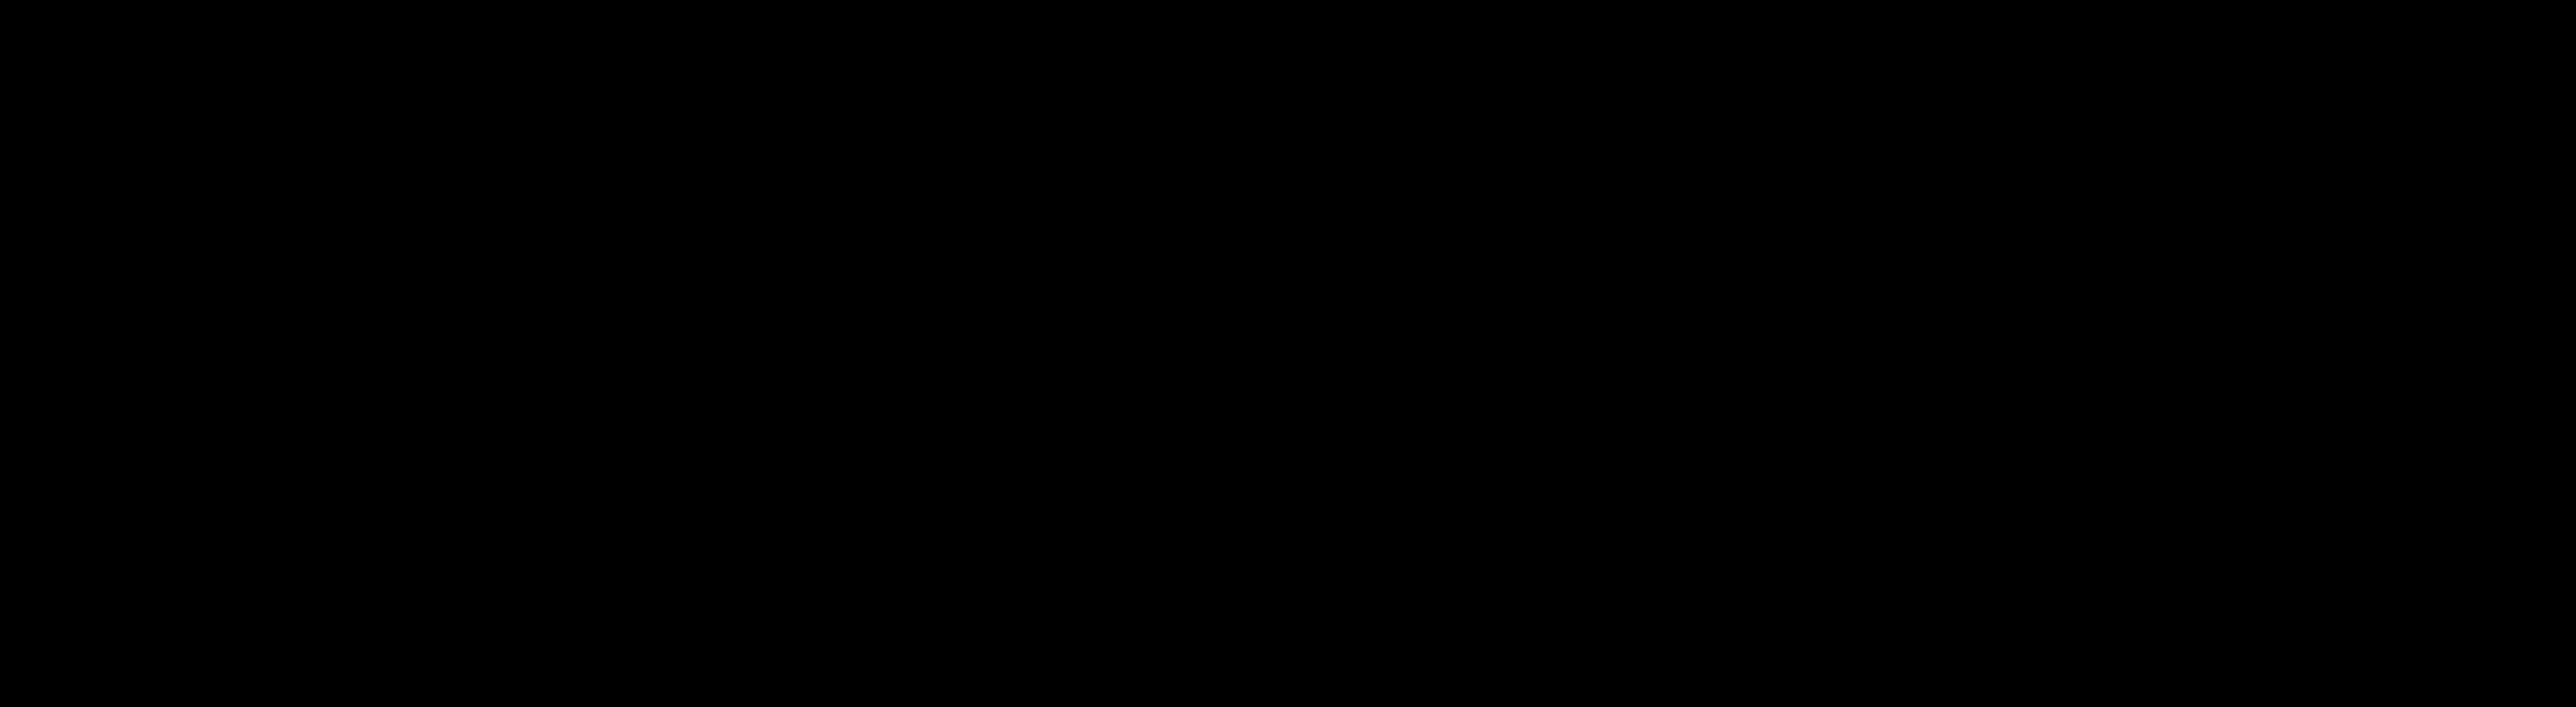 Playatuner